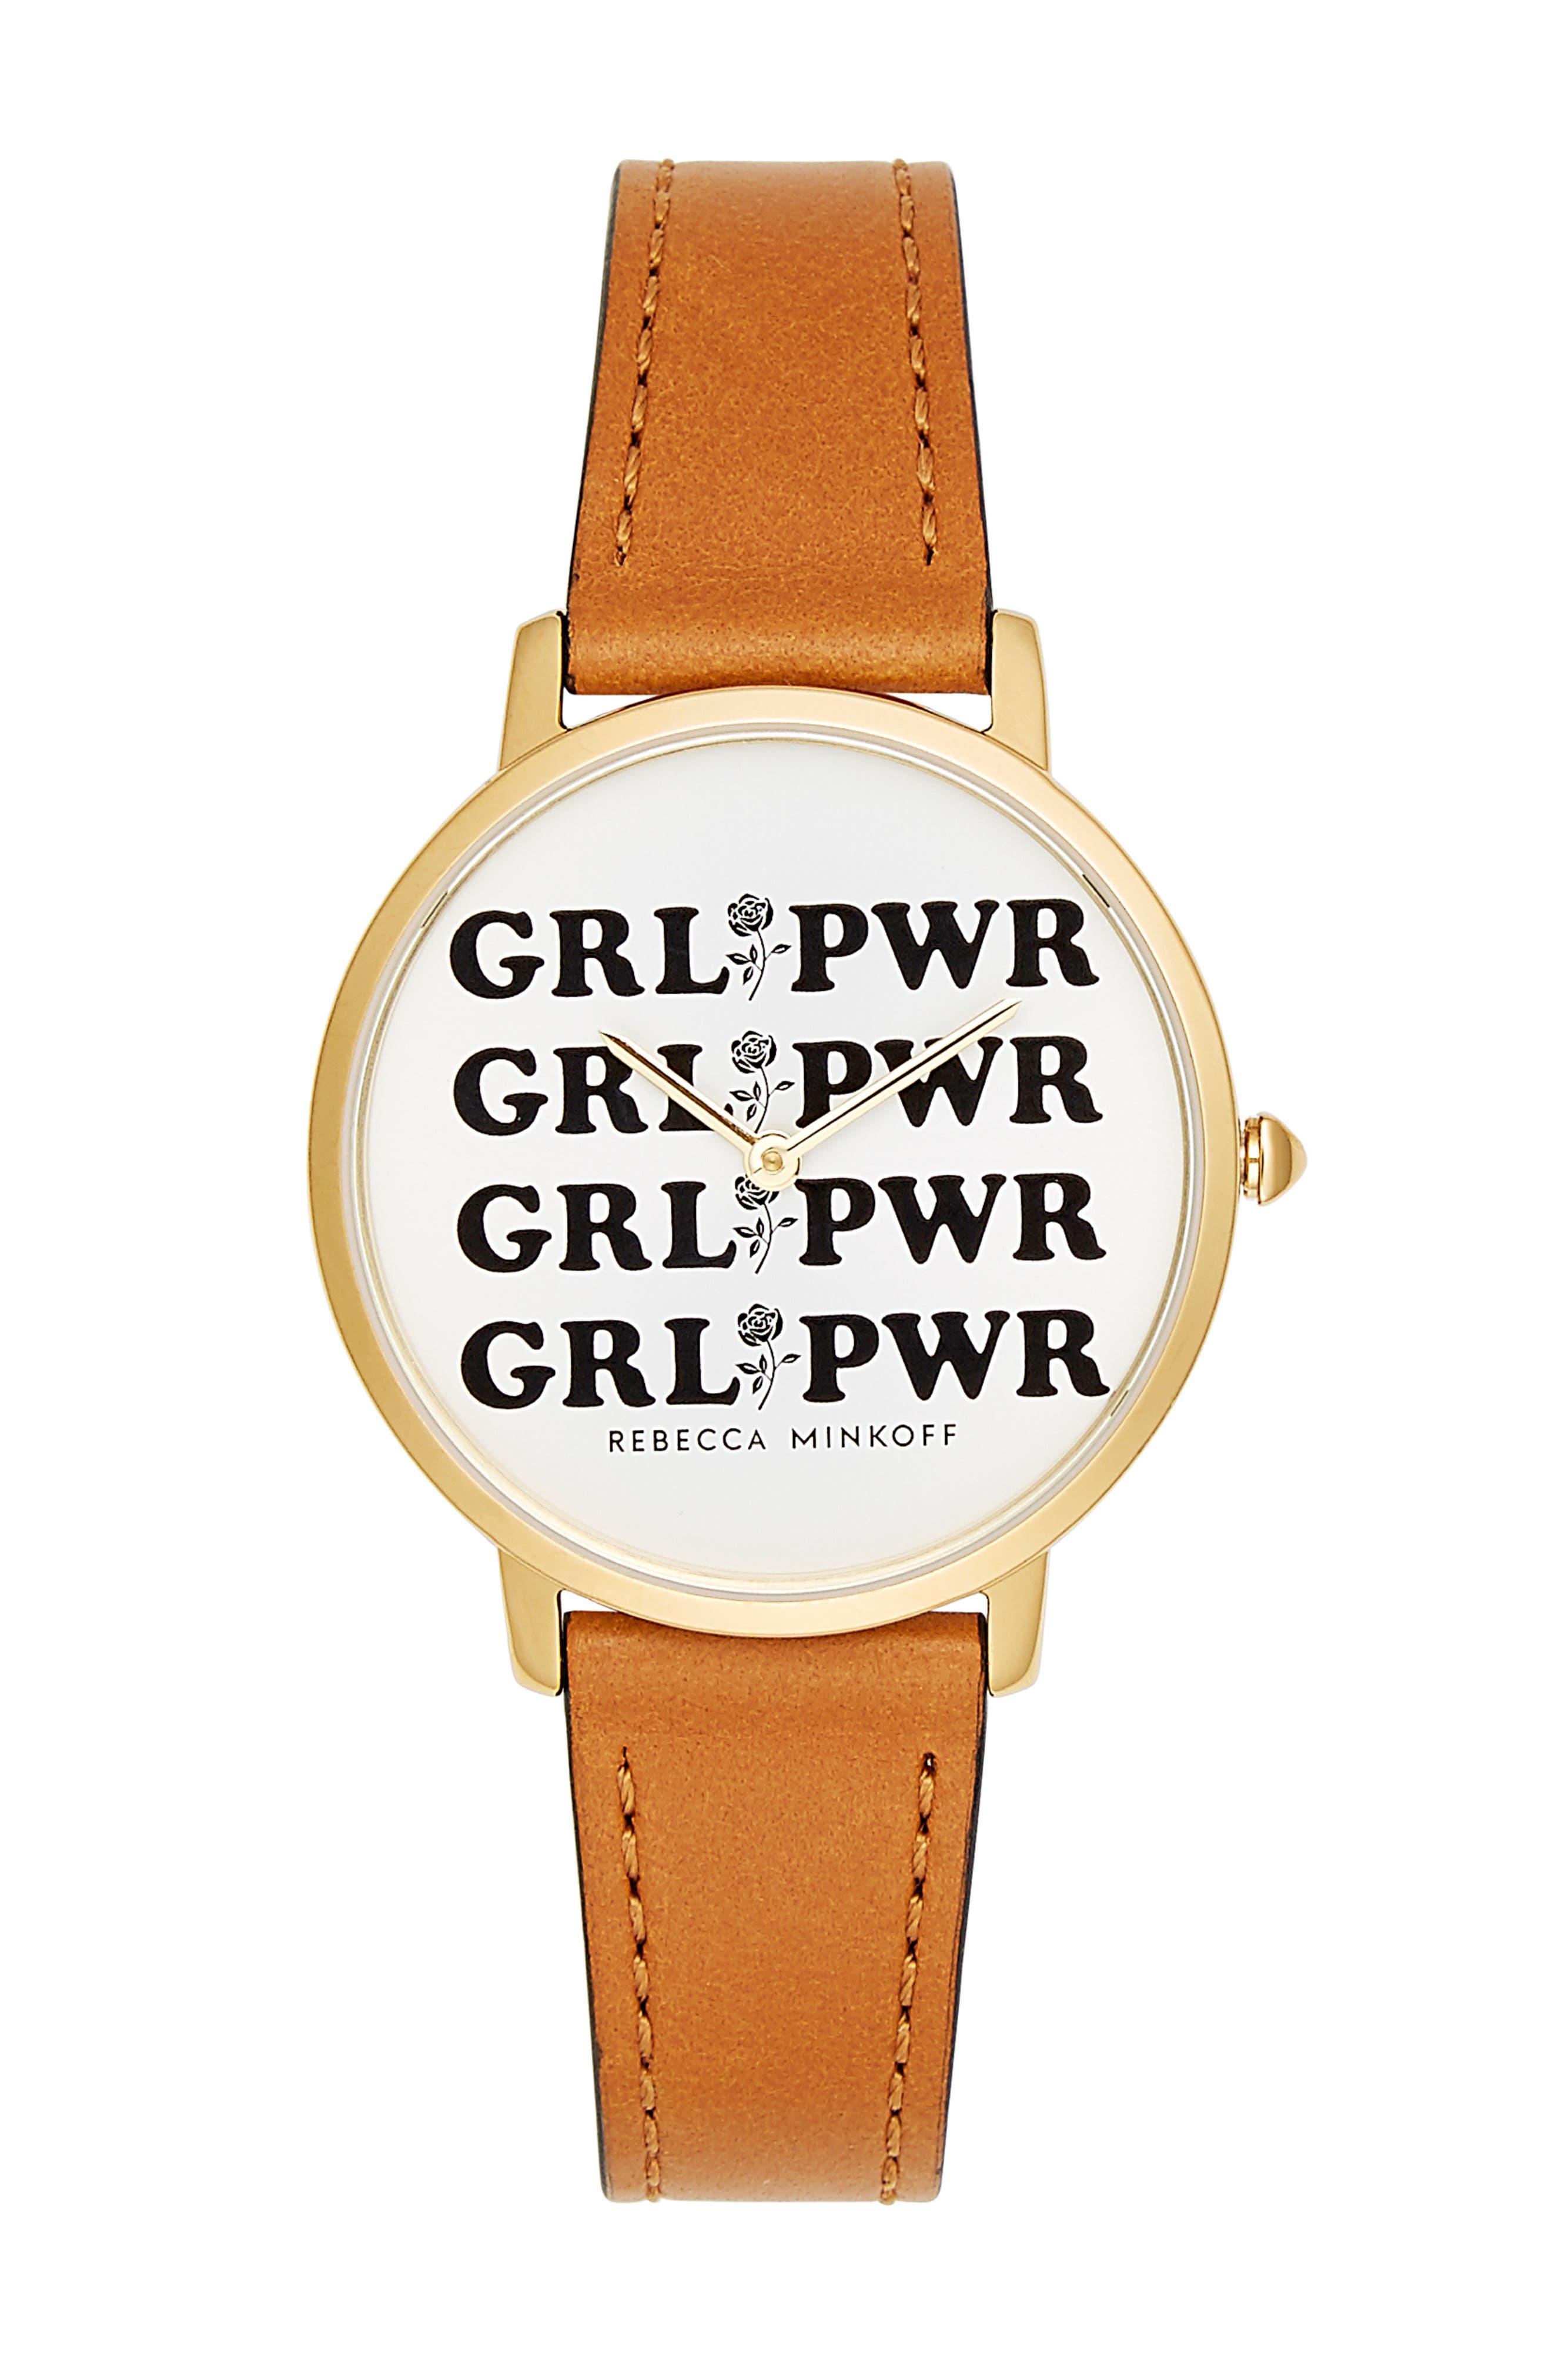 REBECCA MINKOFF,                             Rebeca Minkoff Major GRL PWR Leather Strap Watch, 35mm,                             Main thumbnail 1, color,                             200